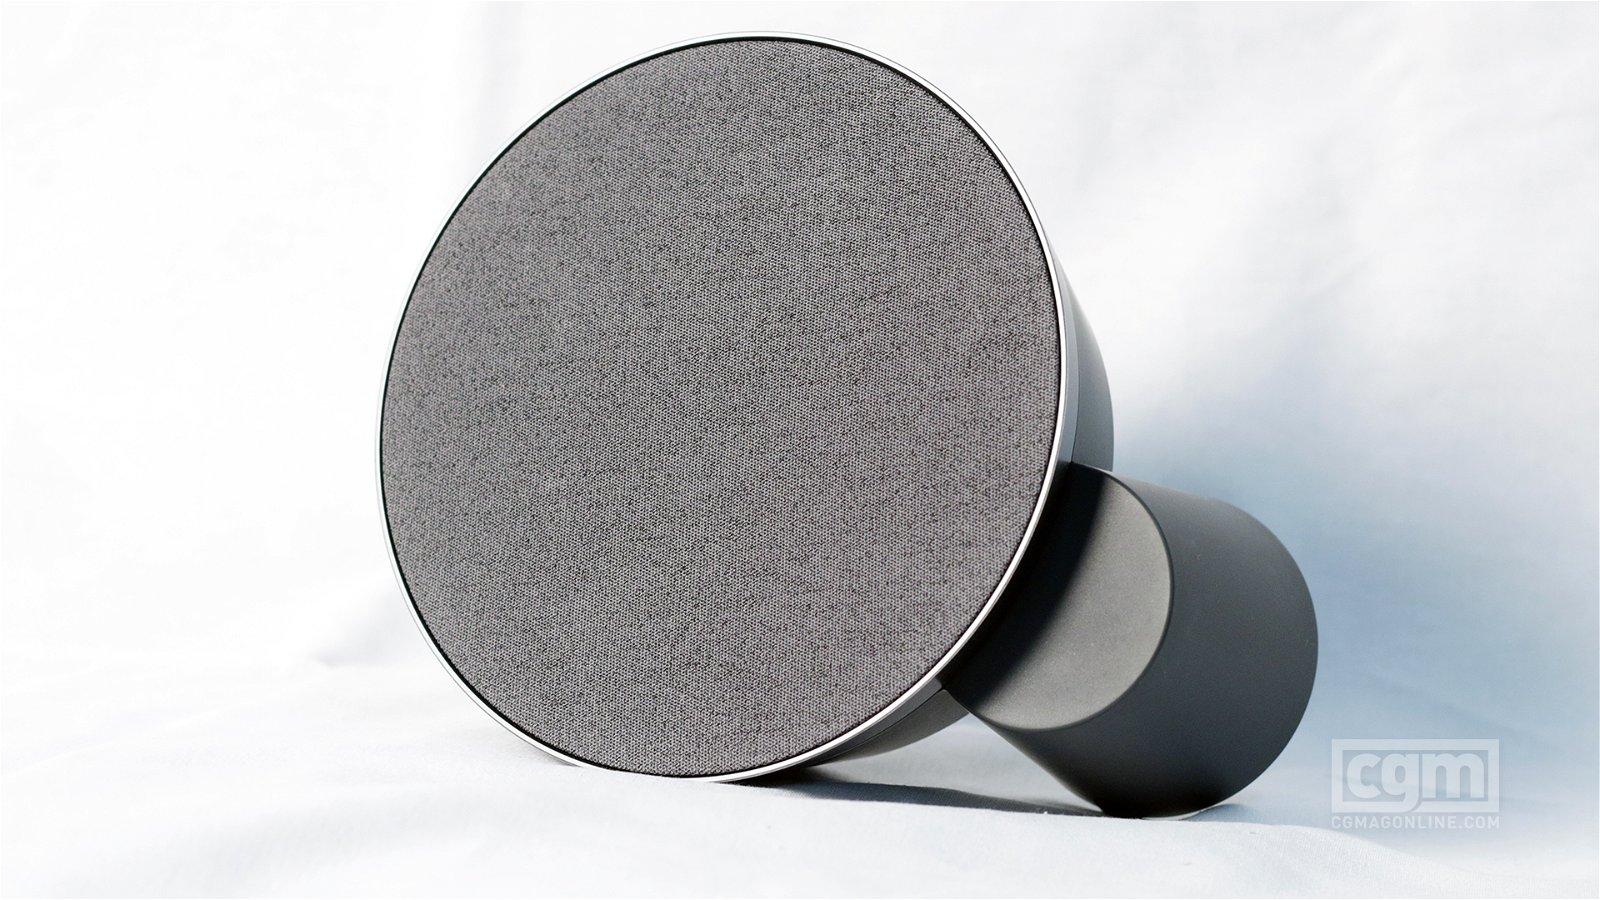 Logitech MX Sound Speakers Review 2